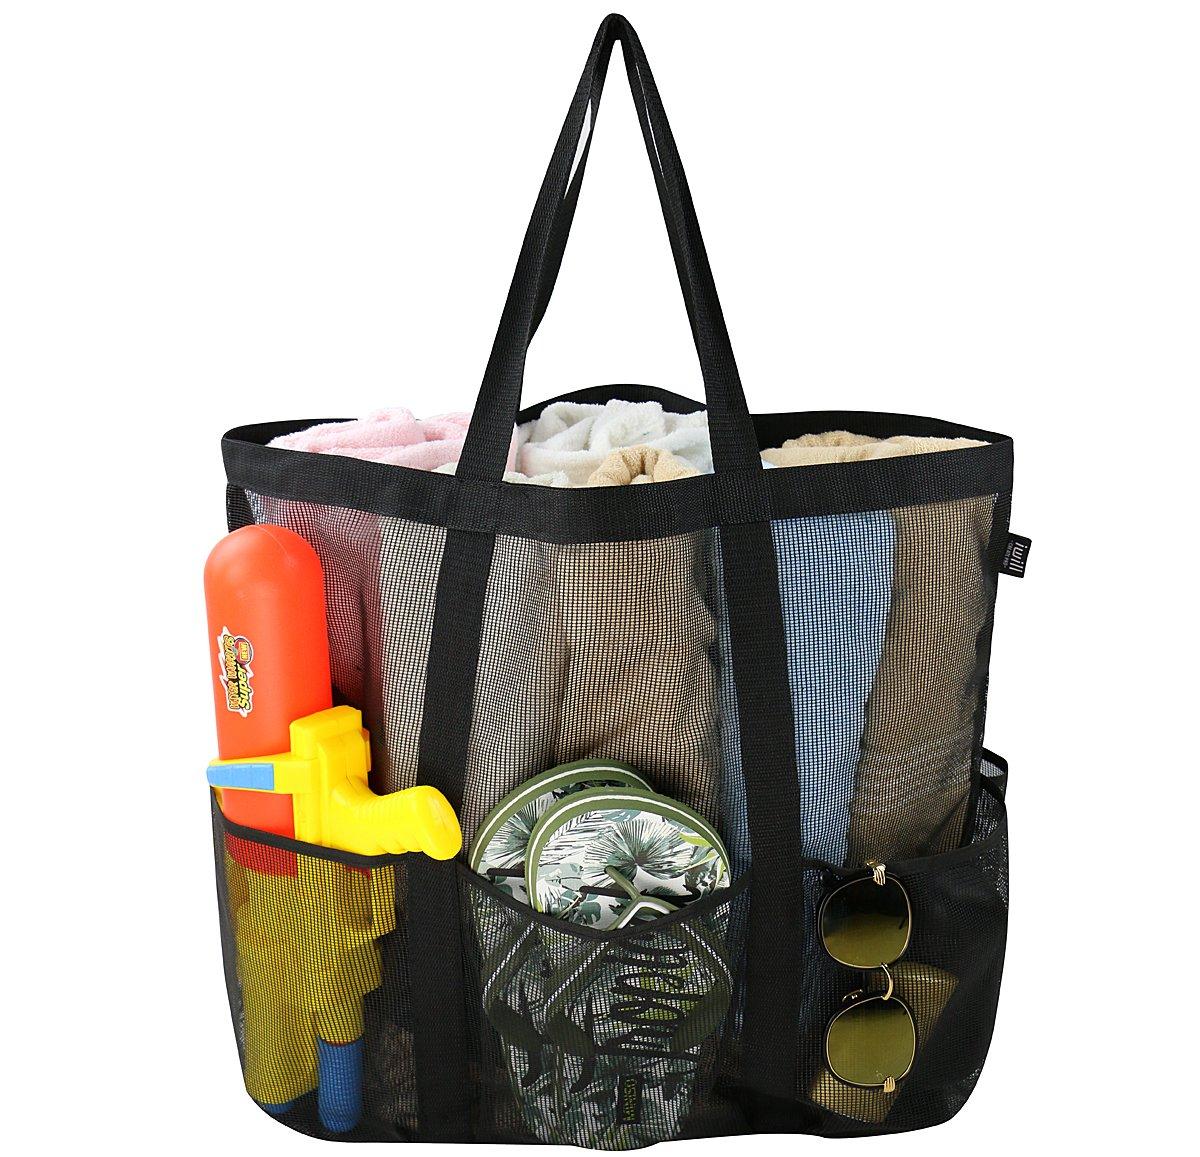 bolsa de almacenamiento de juguetes de arena mosquet/ón bo bolsa plegable plegable de compras Bolsa grande de malla de playa bolsa de cord/ón con 6 bolsillos bolsa de almacenamiento de comestibles